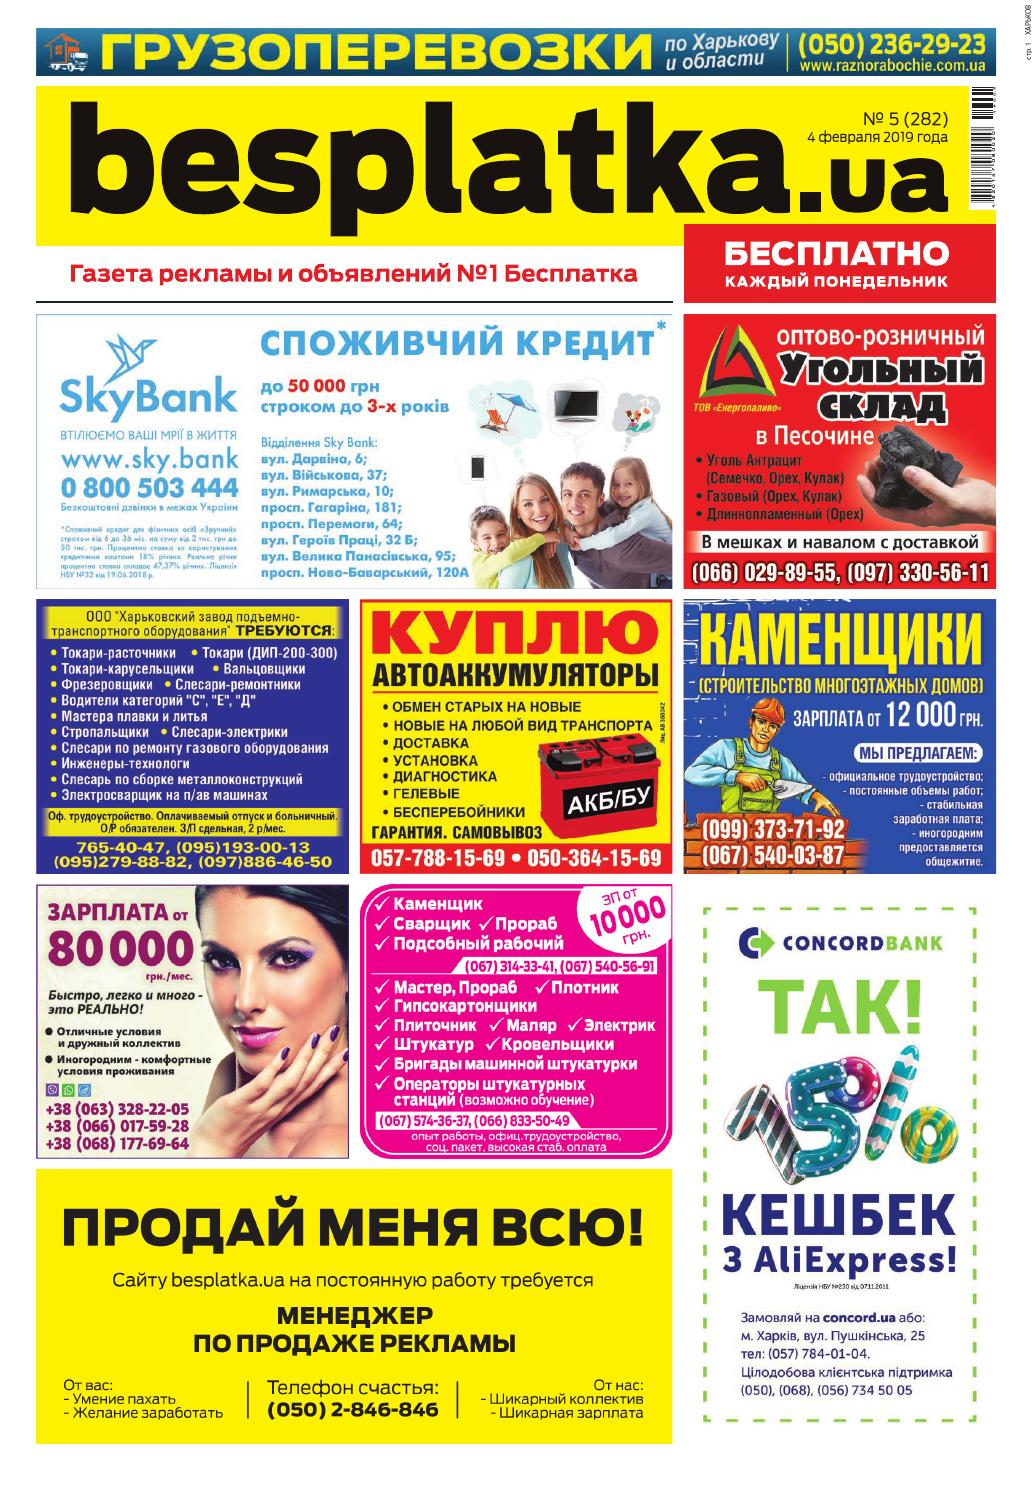 77438b462aee7 Besplatka #5 Харьков by besplatka ukraine - issuu